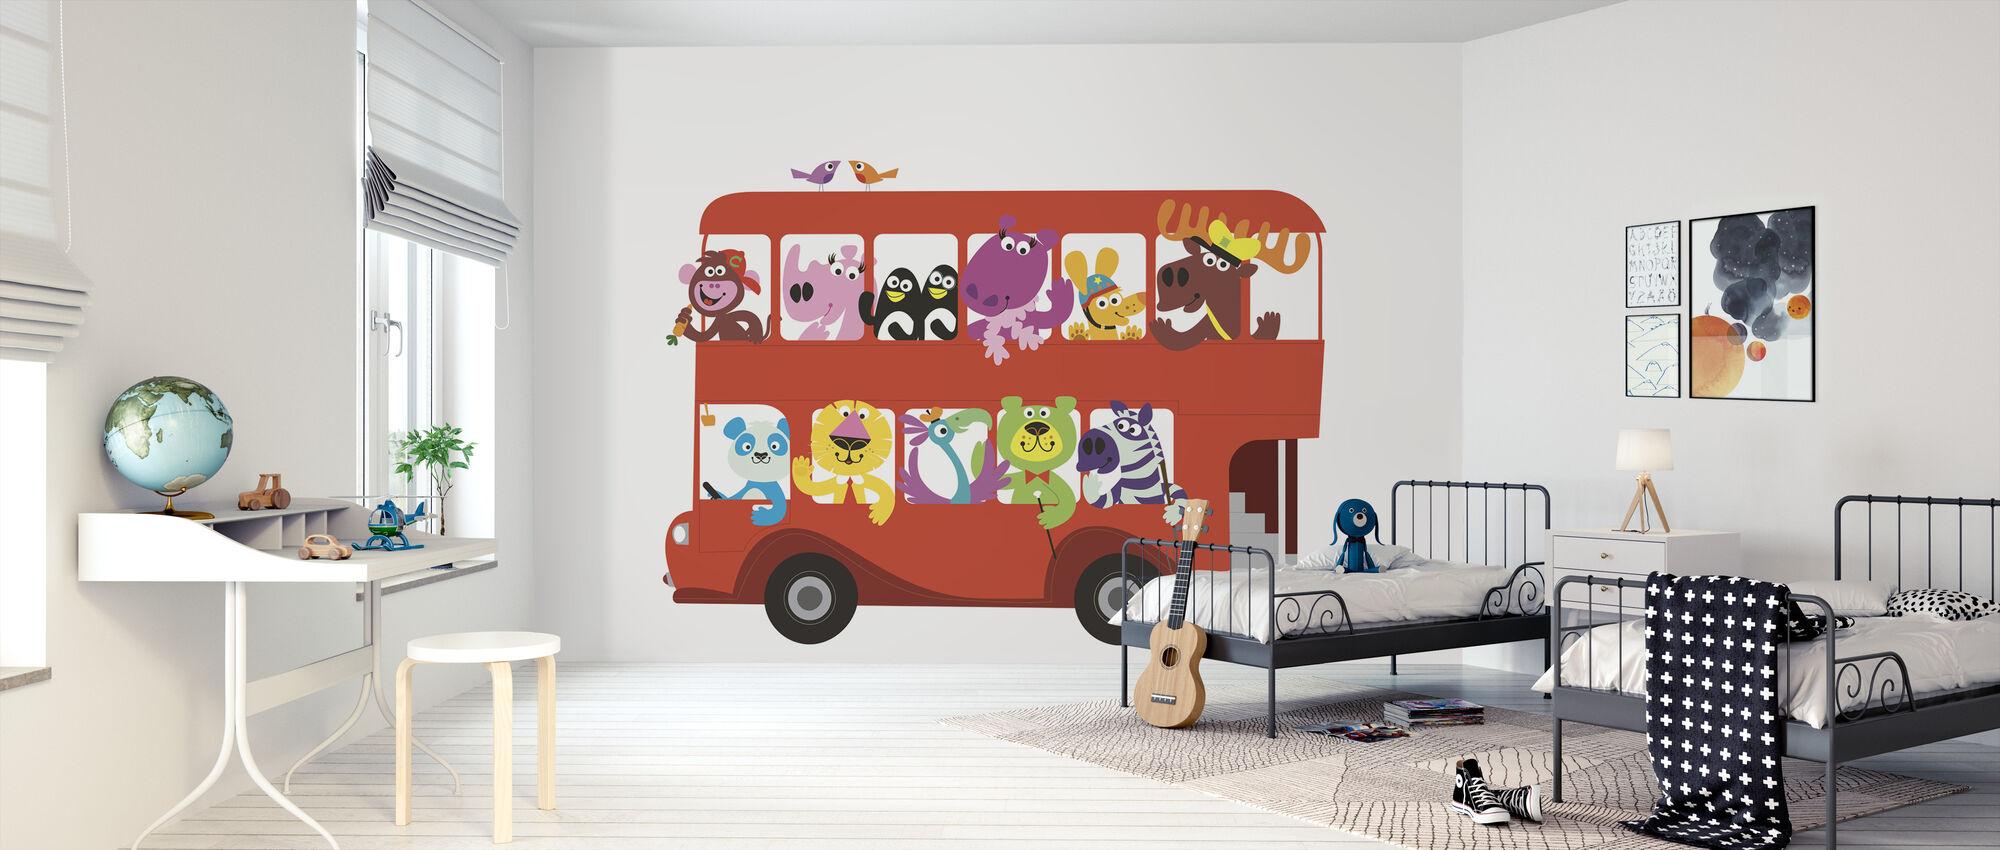 All on Board the Marsh Mellow Island Bus - Wallpaper - Kids Room